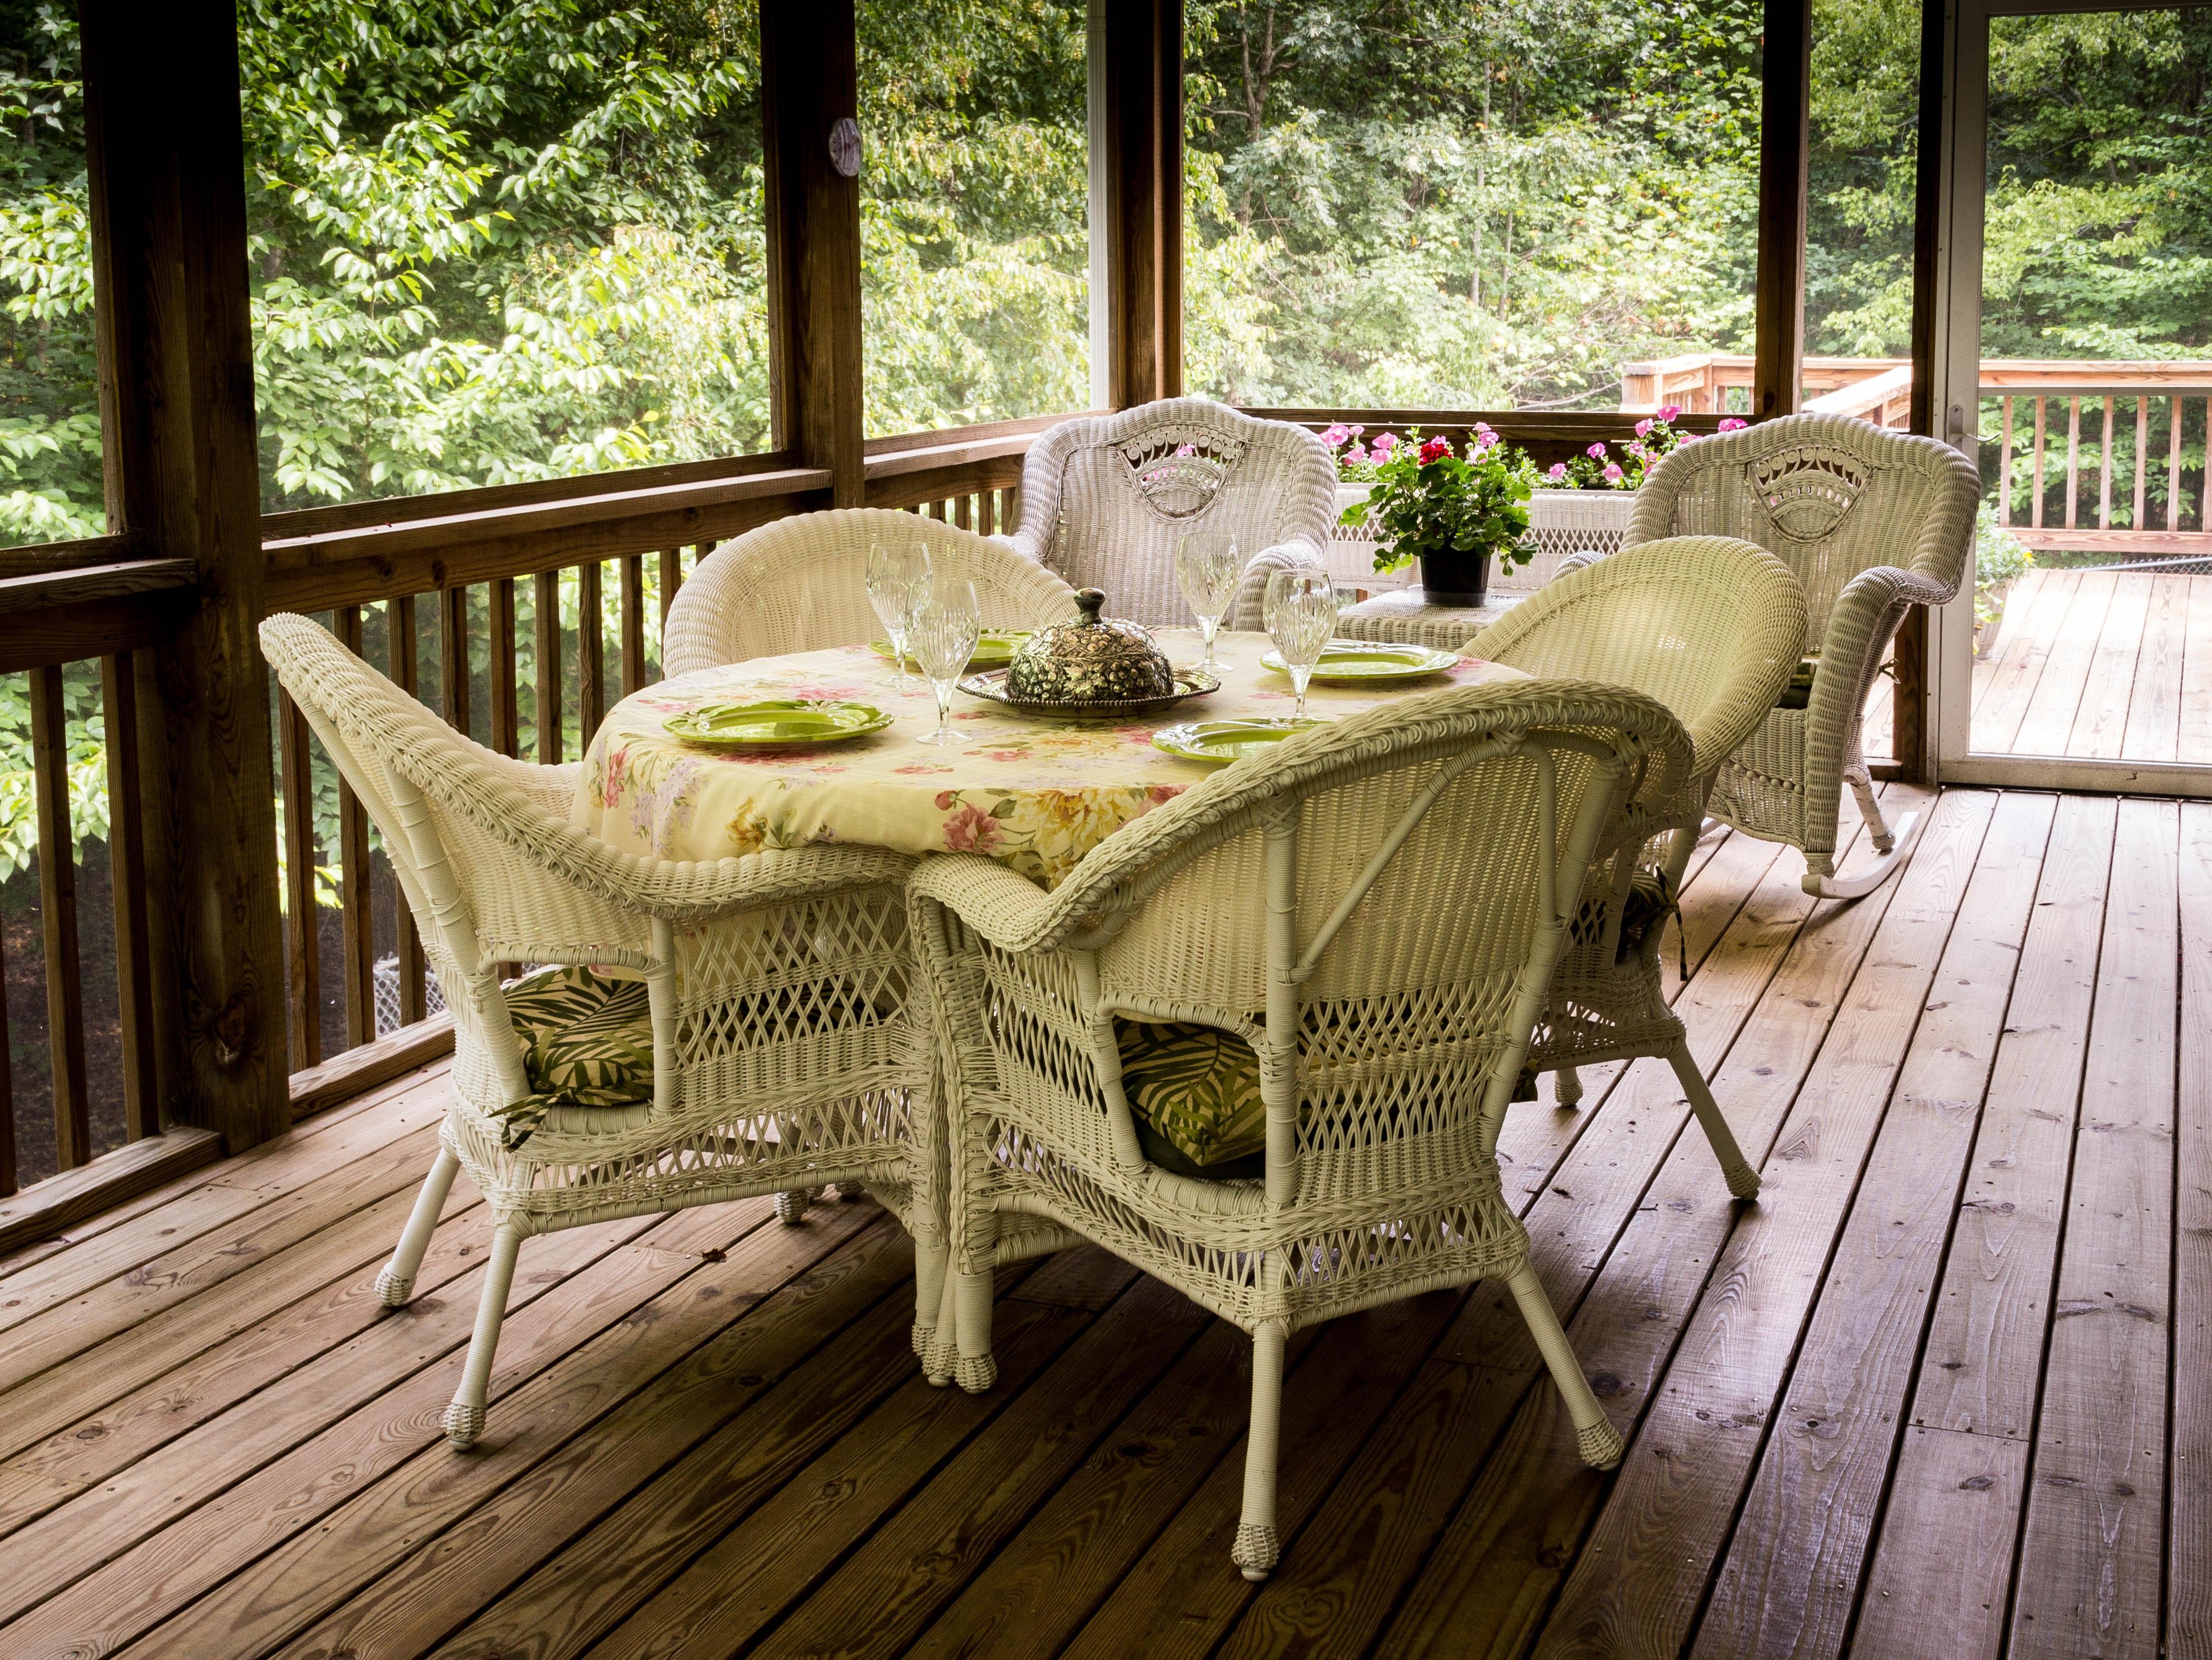 Free Images Deck Wood Villa Home Cottage Backyard